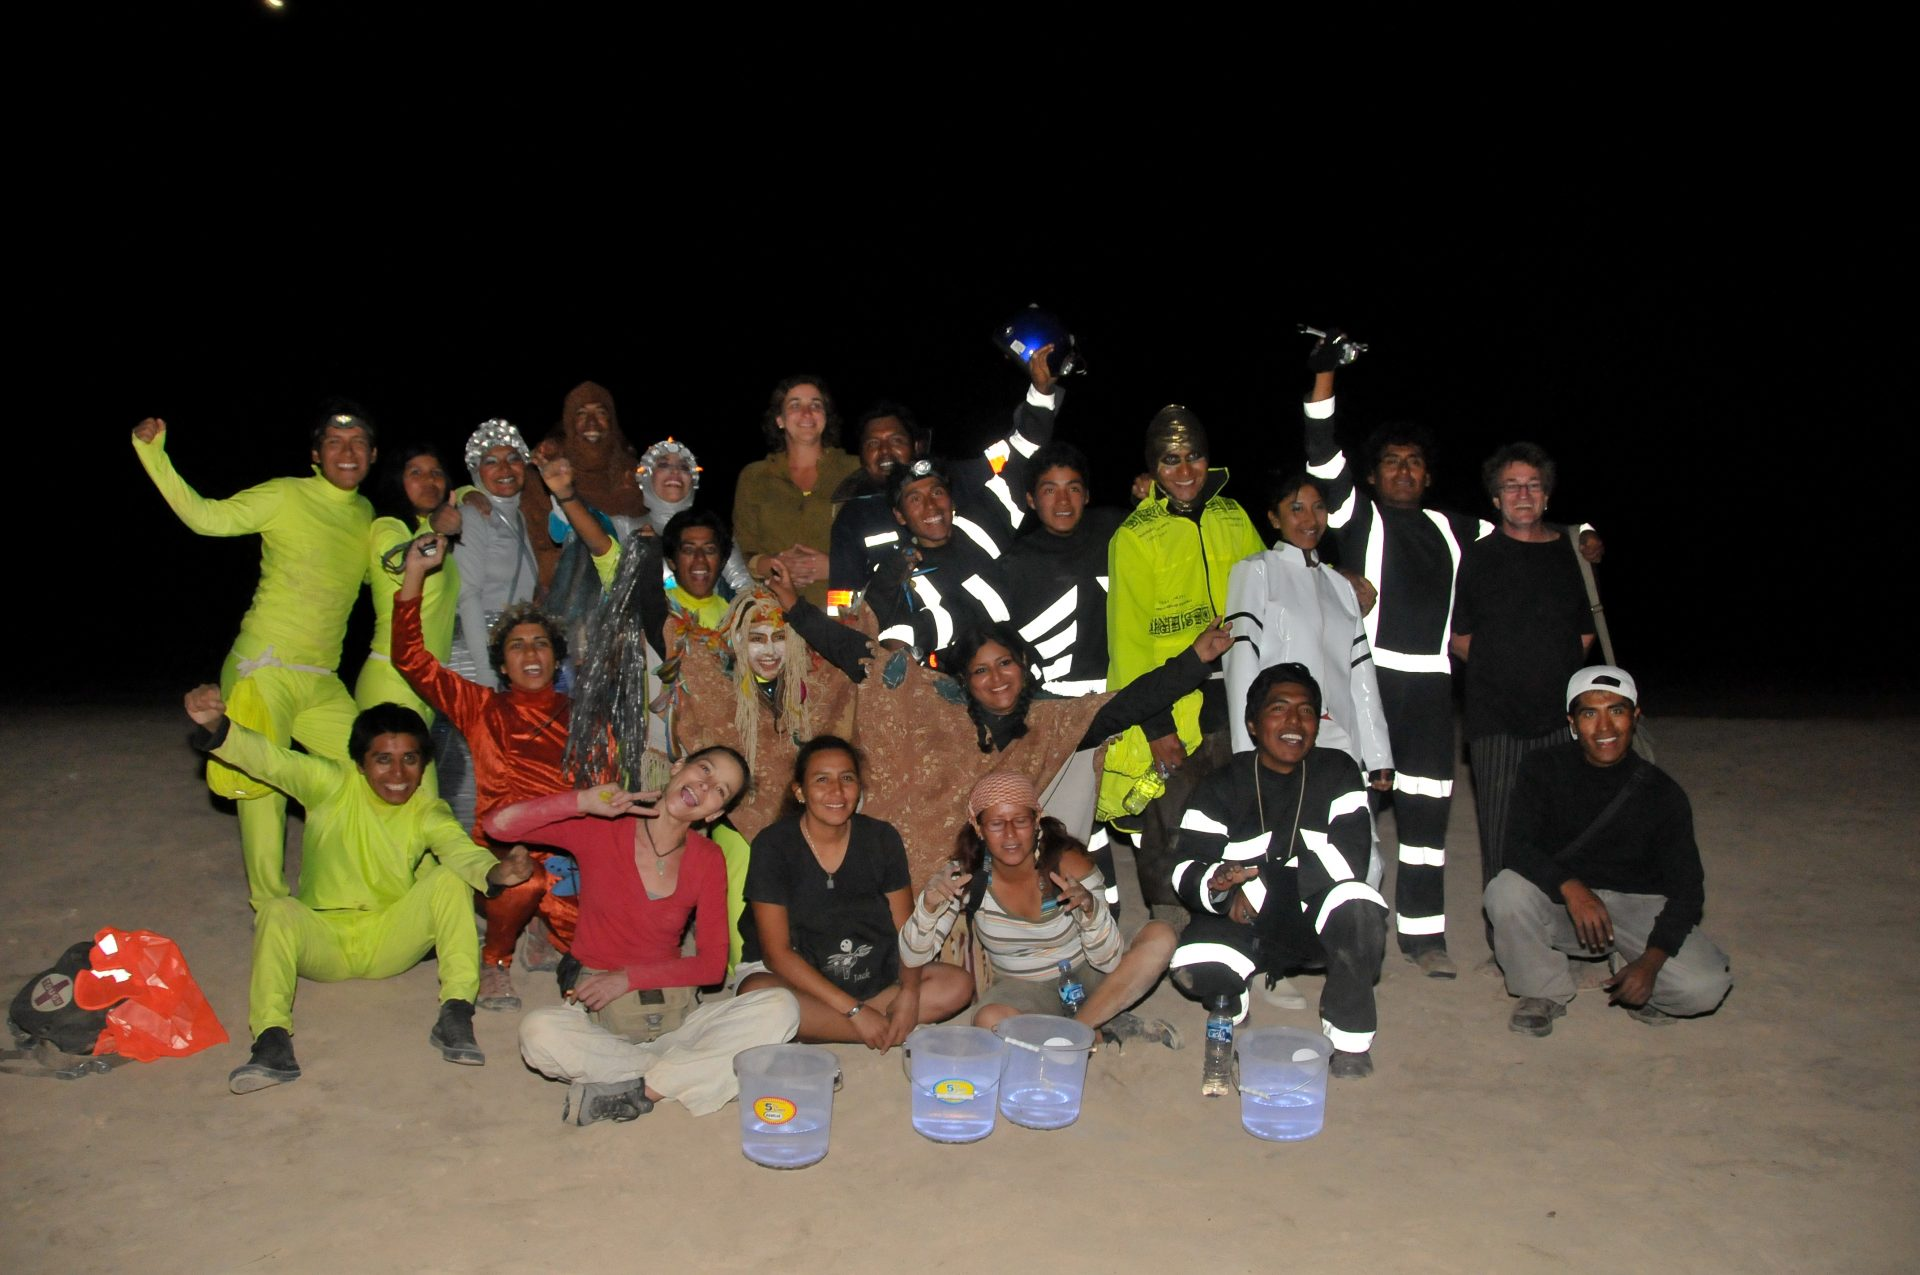 2008_peru_desierto_present3_45_desert_sun